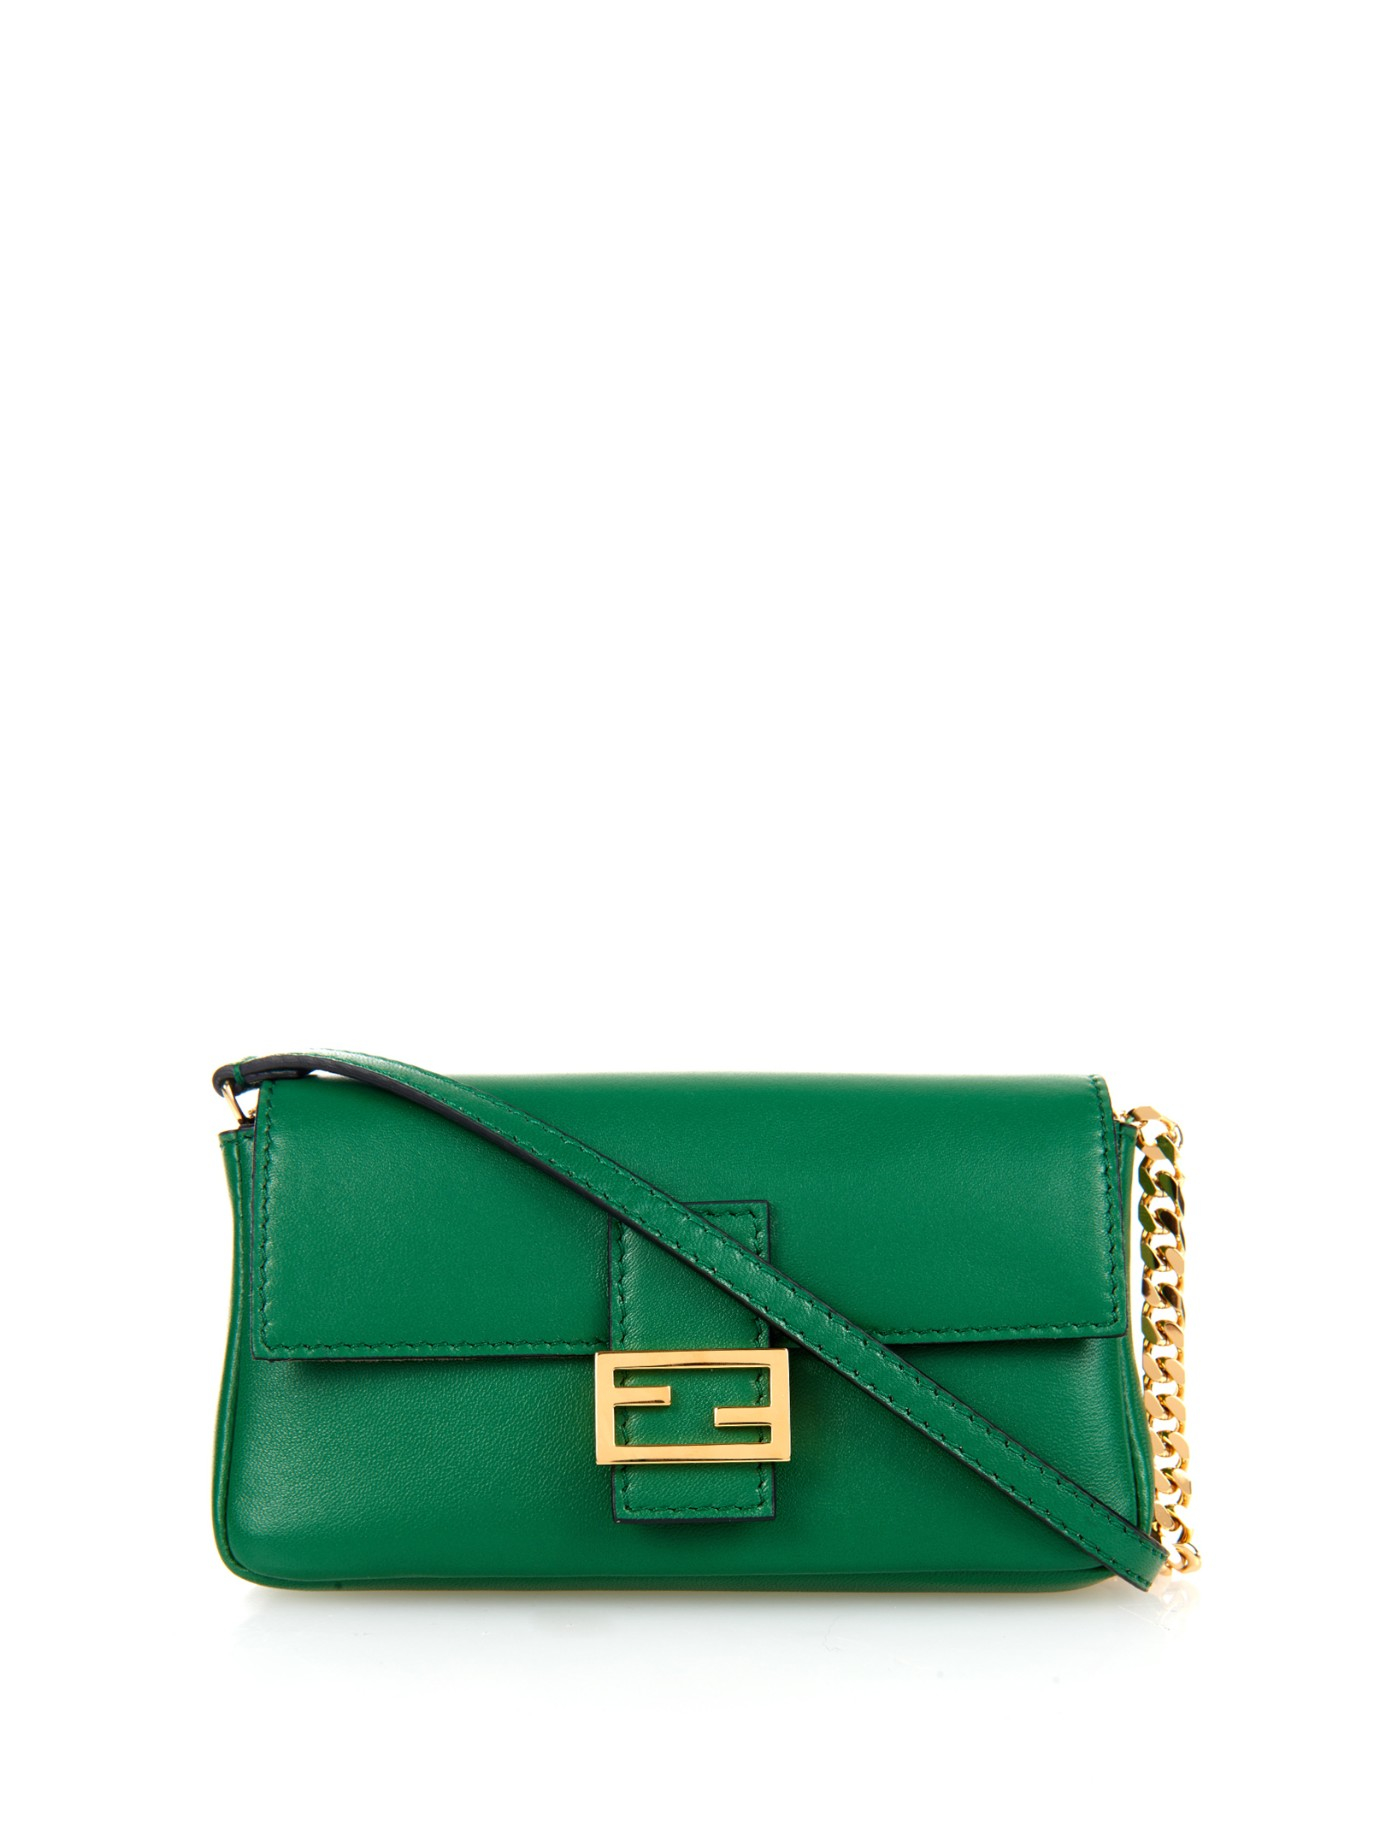 ... sale lyst fendi micro baguette leather cross body bag in green 92bb9  3bbc8 clearance fendi vitello ... de23ee0687b02